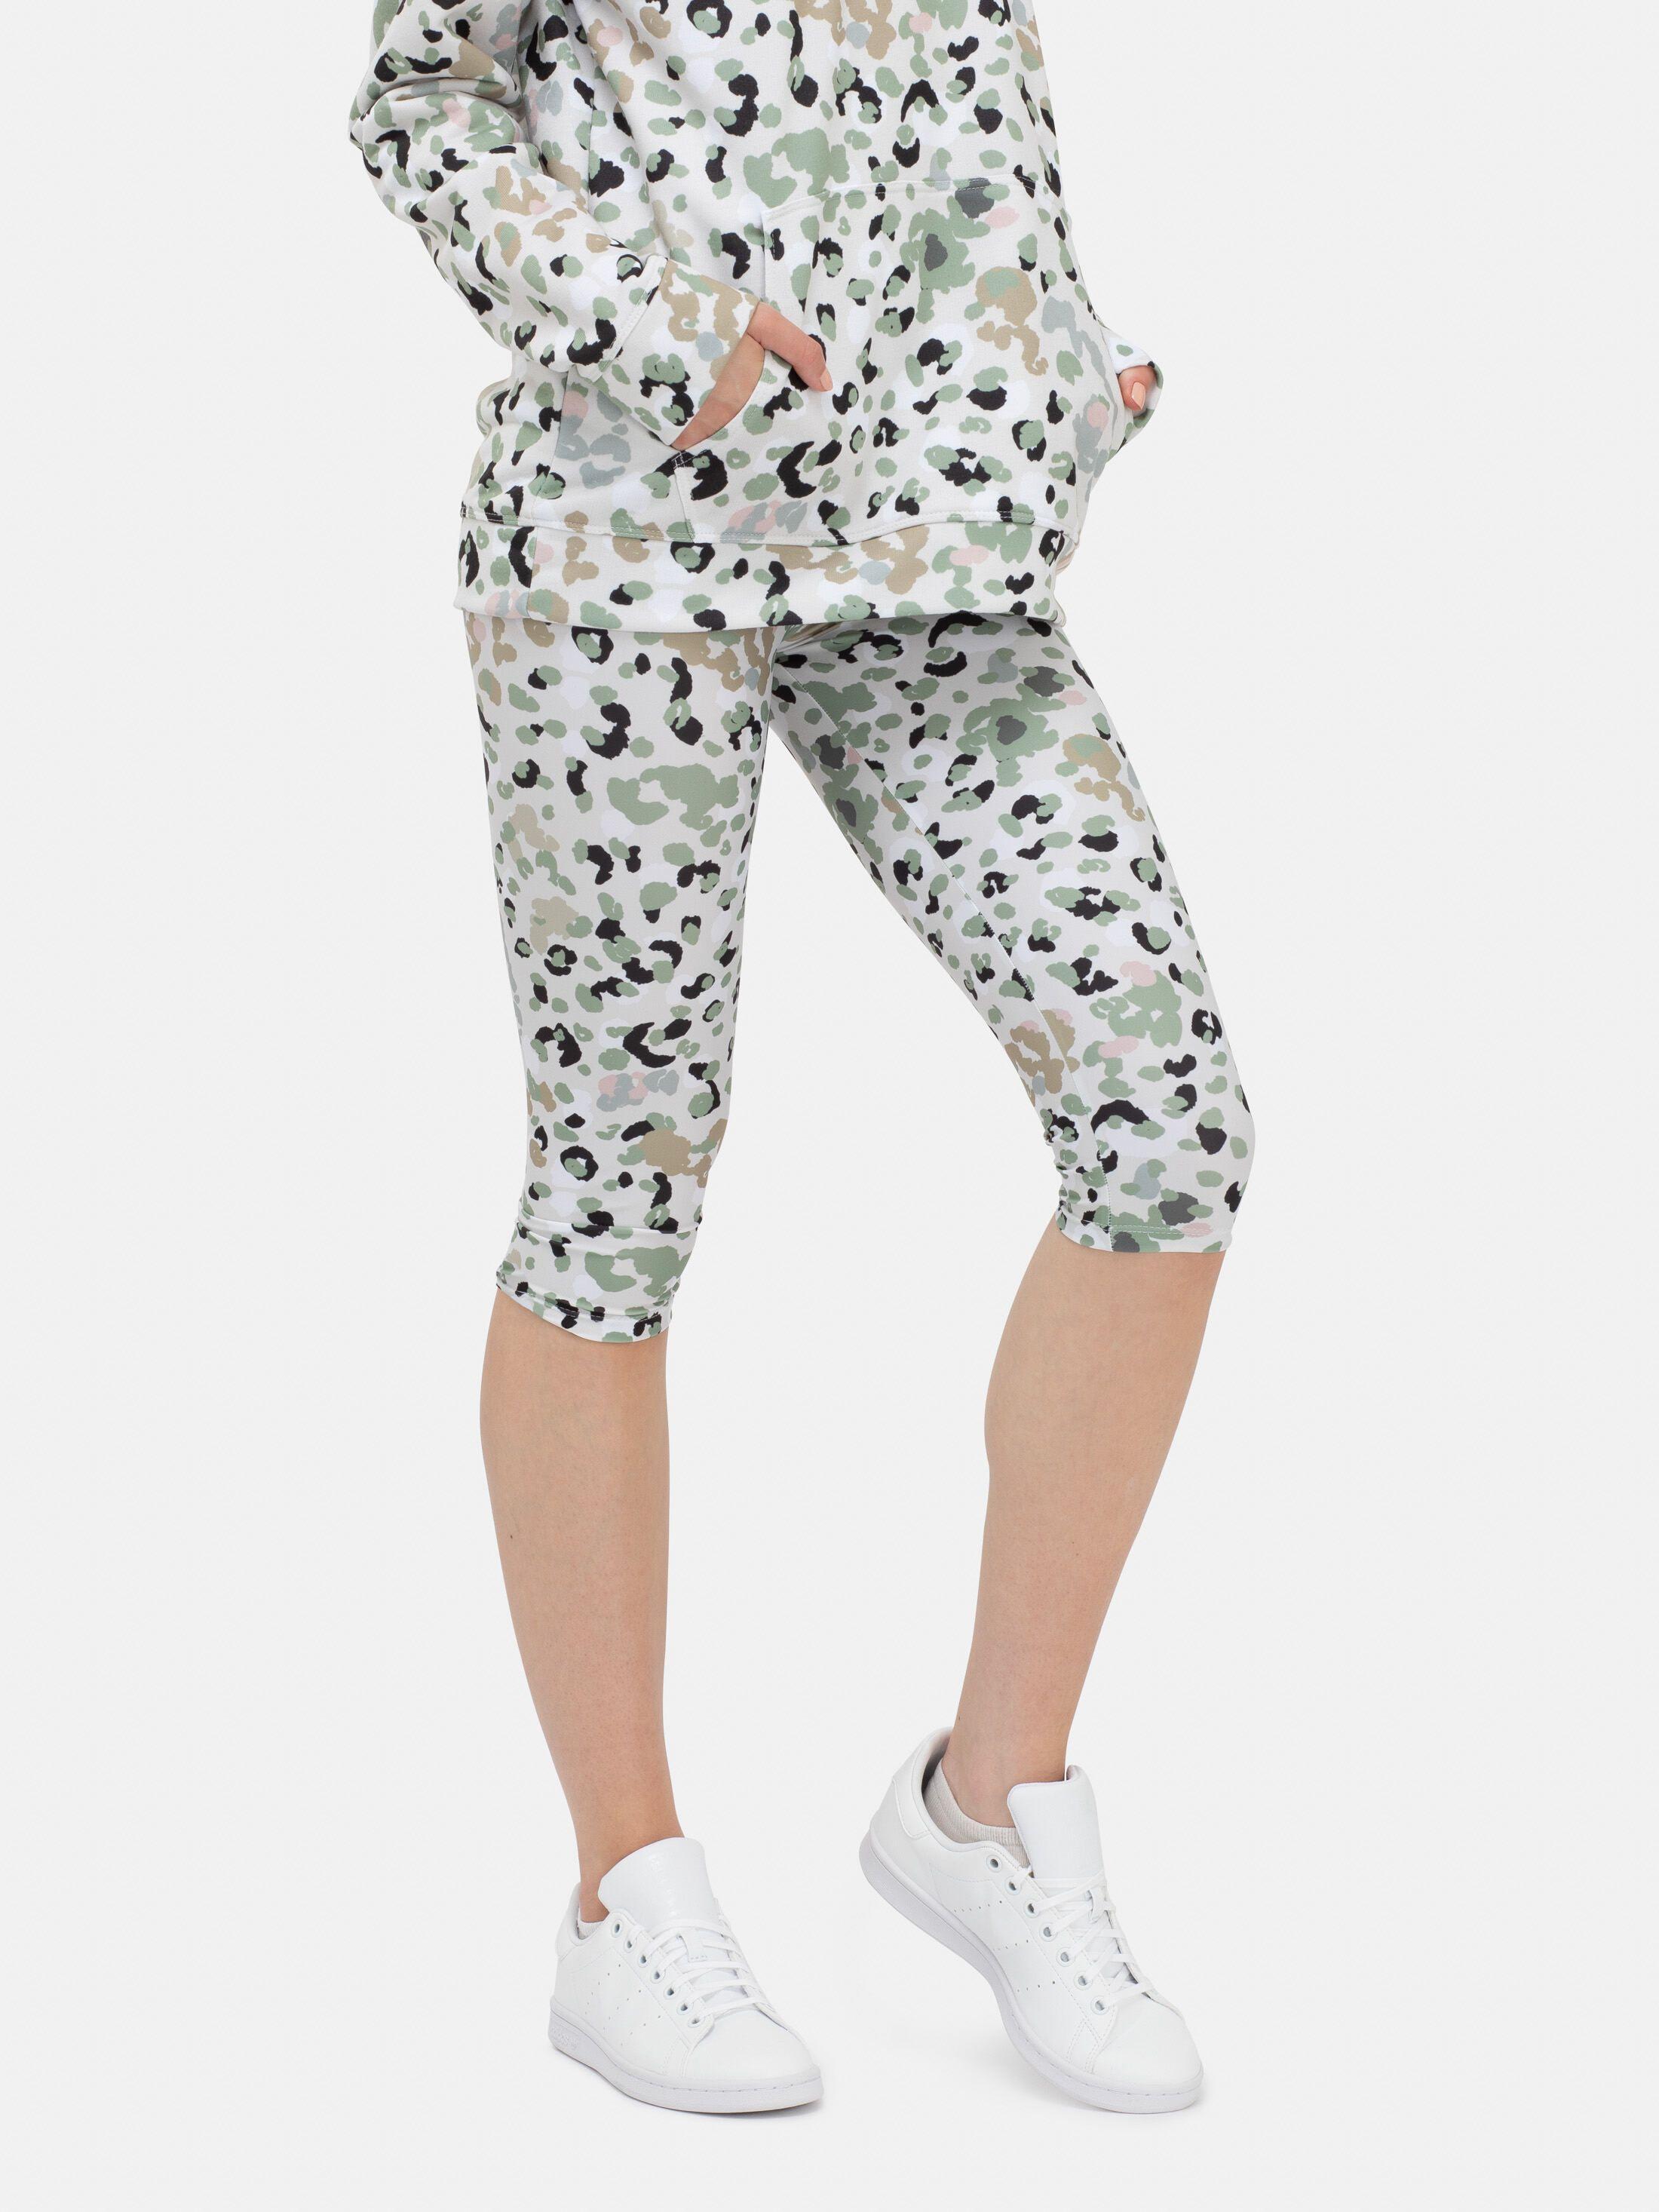 front back shot of personalised leggings